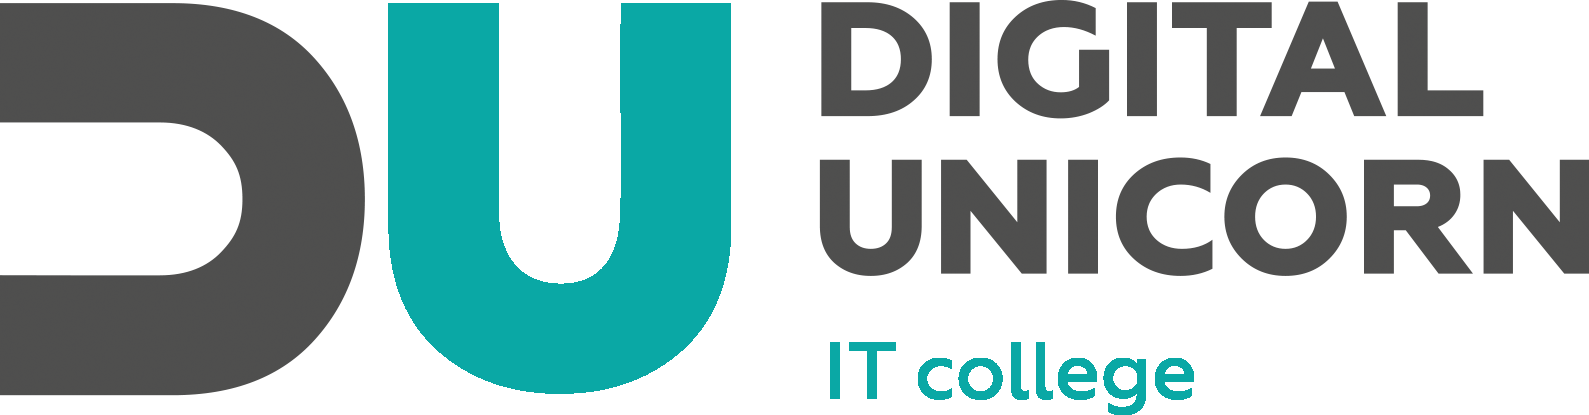 IT college Digital Unicorn